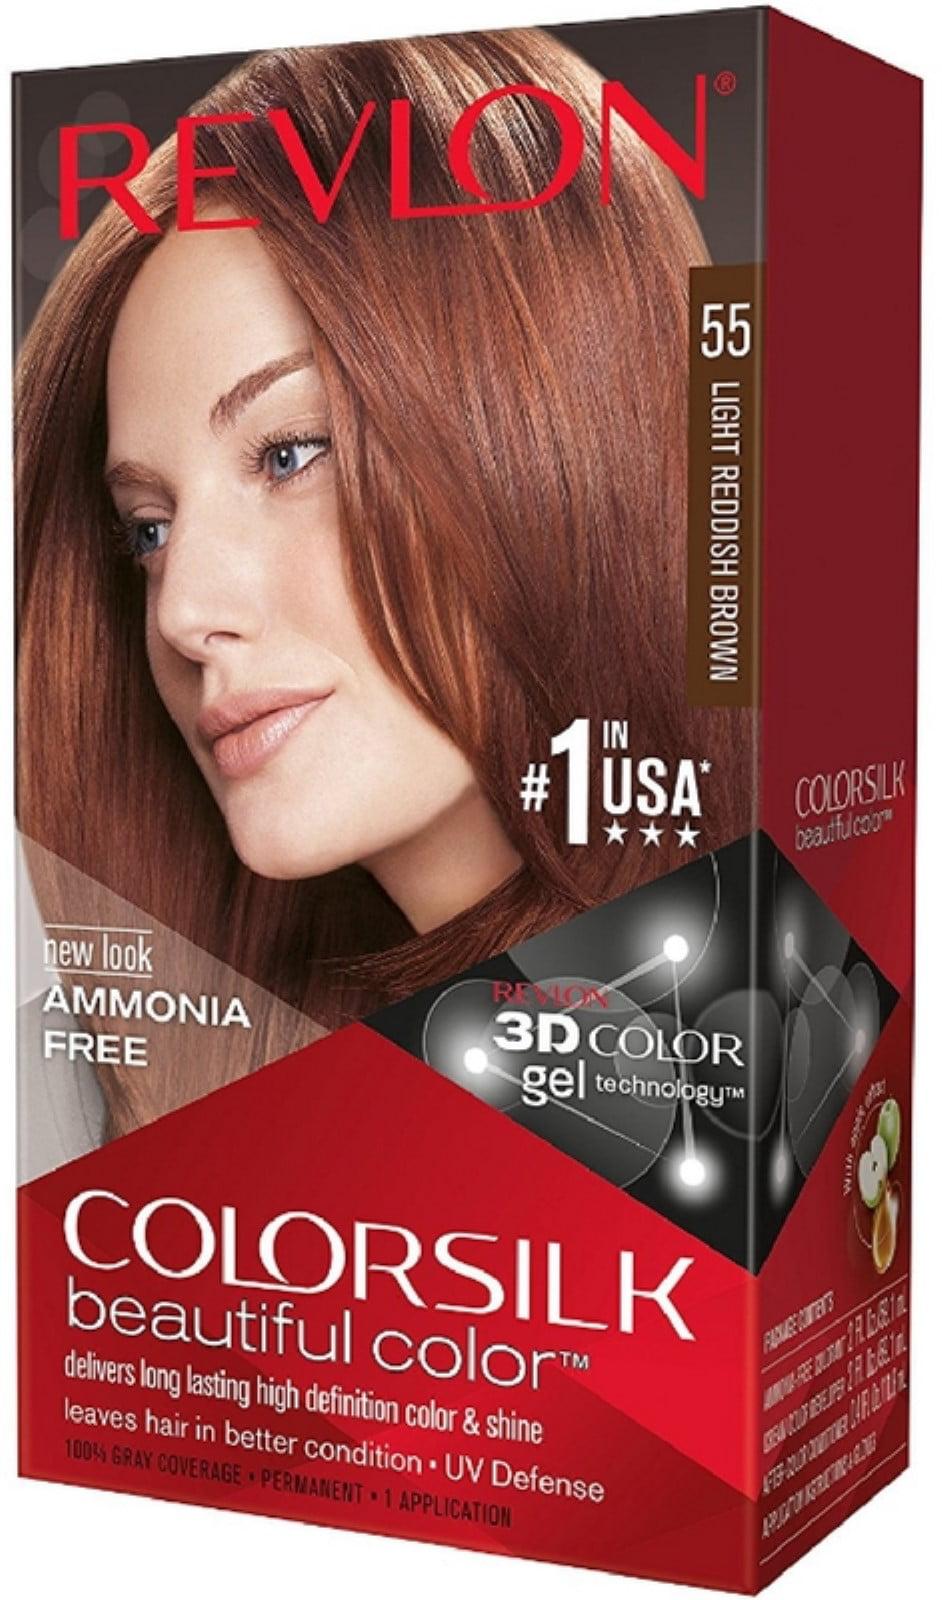 Revlon Colorsilk Hair Color 55 Light Reddish Brown 1 Each